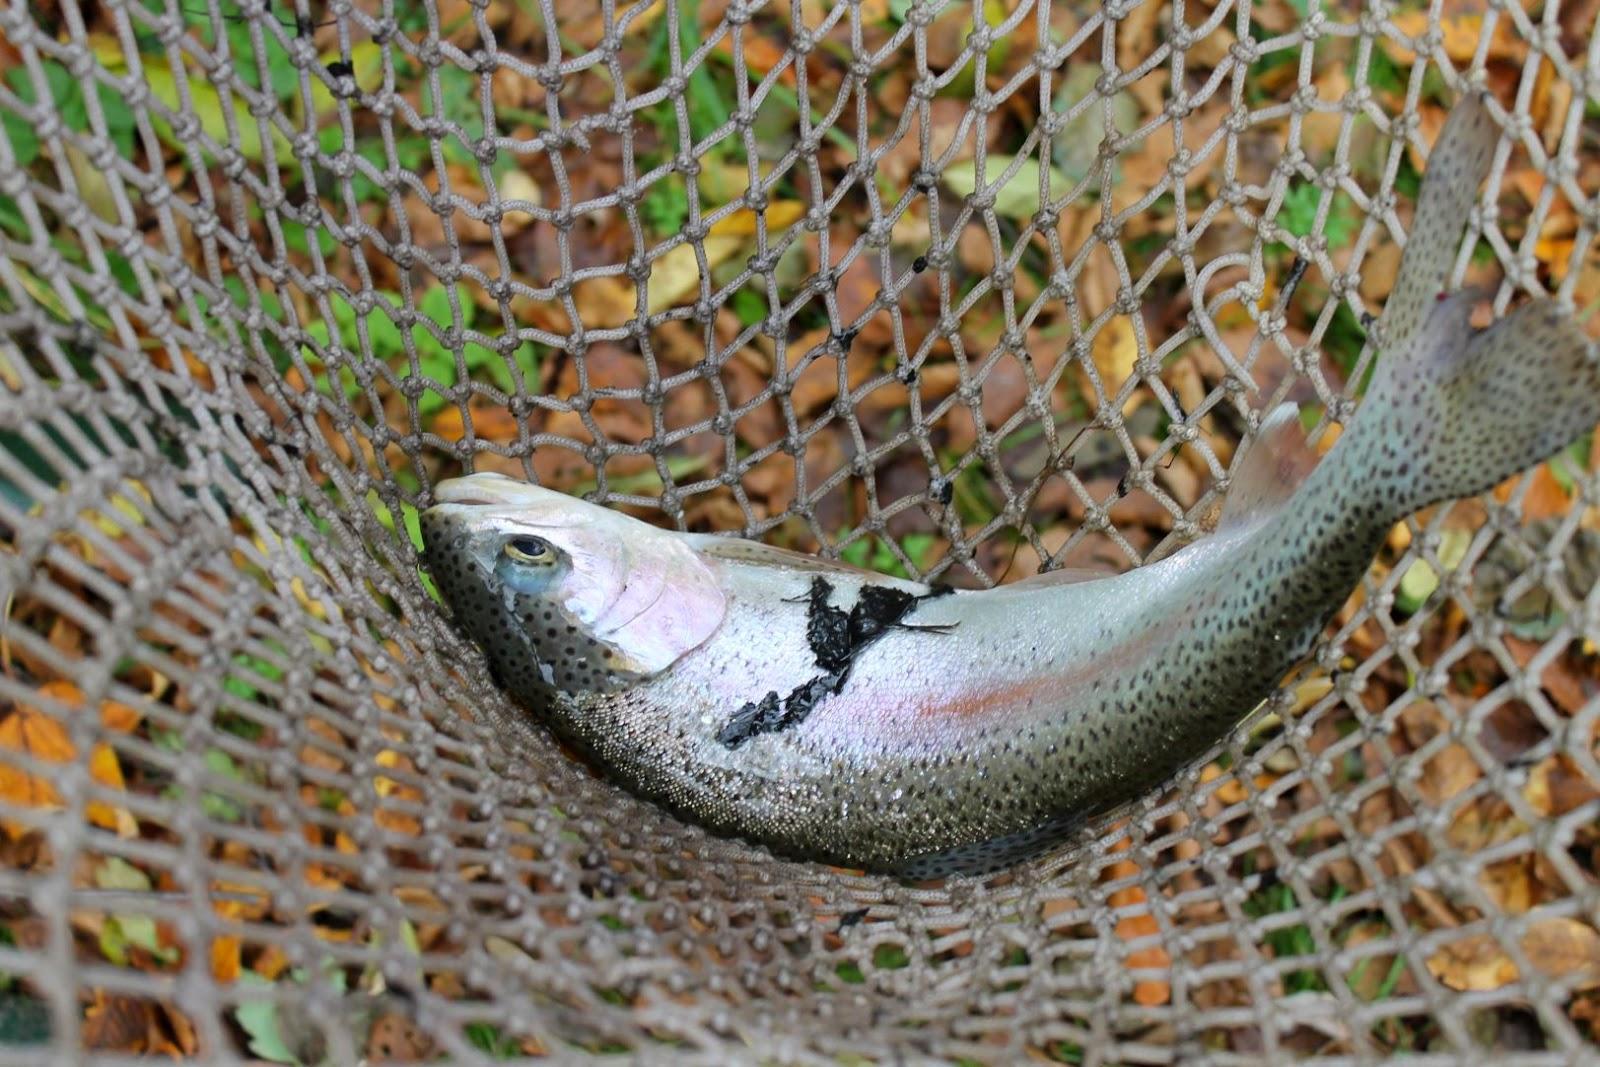 Moosauer hof aktuell oktober 2014 for Jungfische im teich